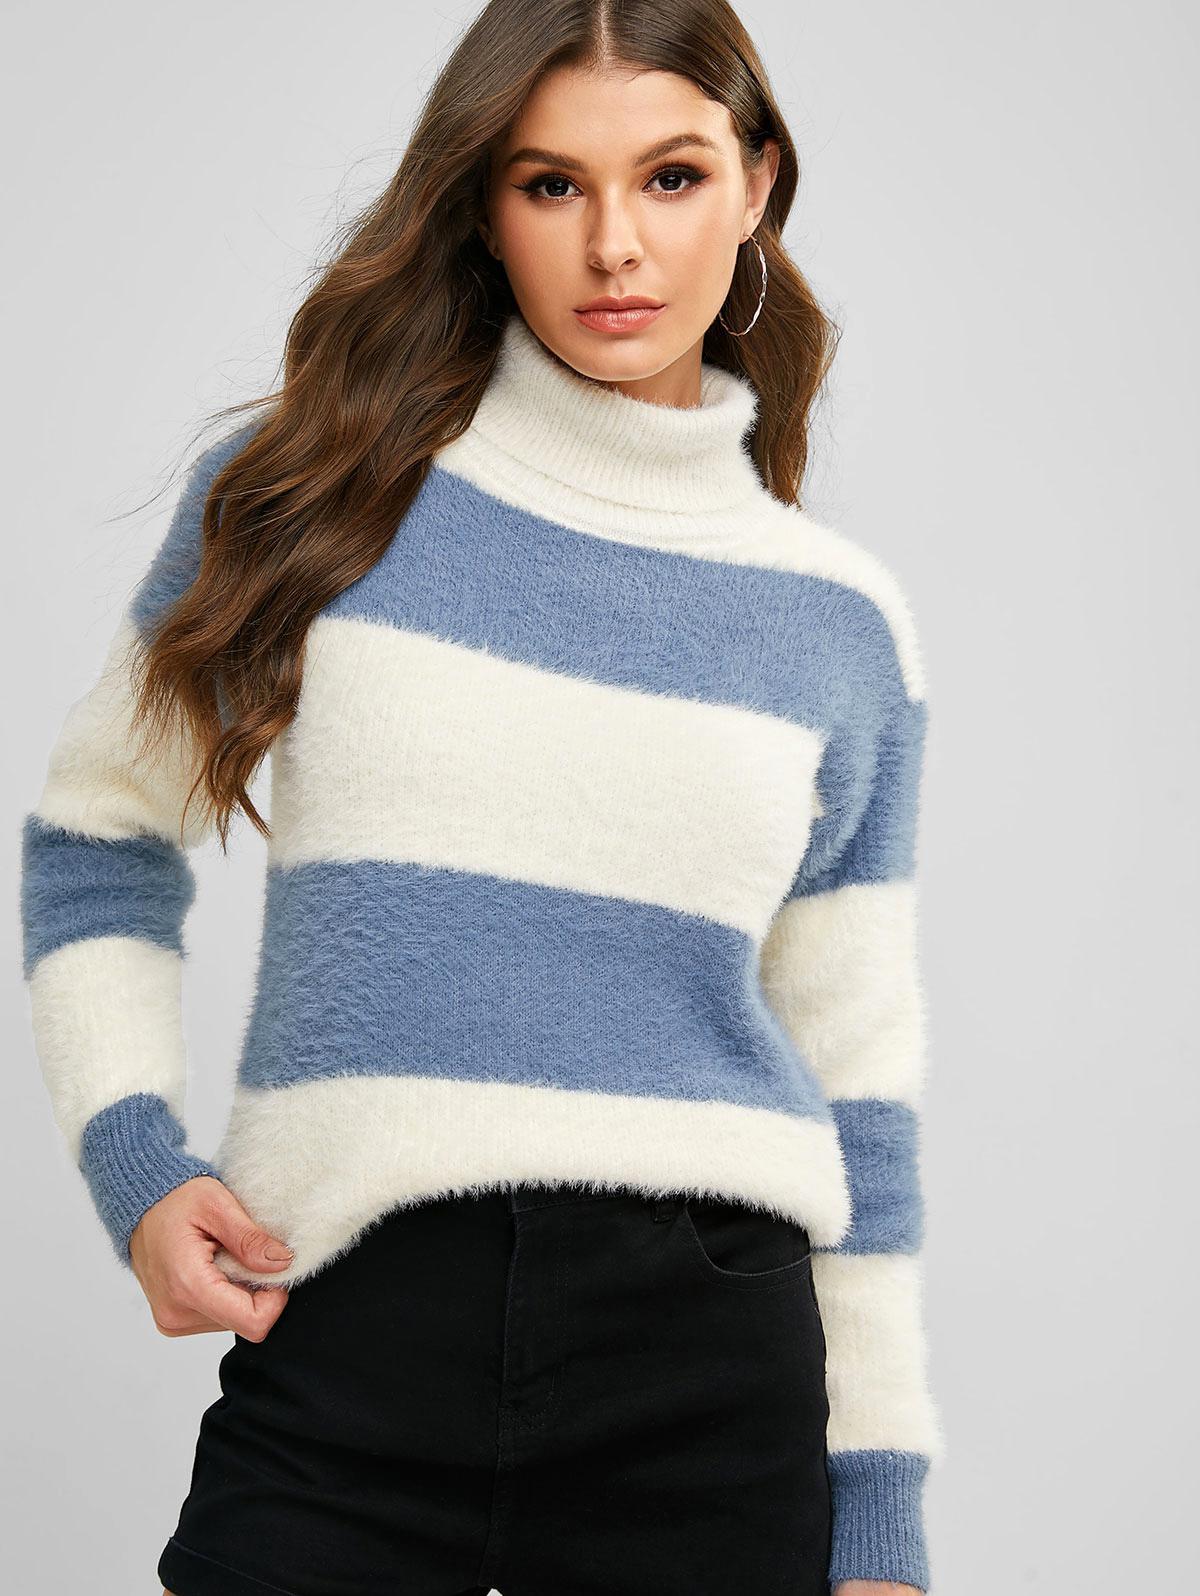 Turtleneck Colorblock Drop Shoulder Fuzzy Sweater